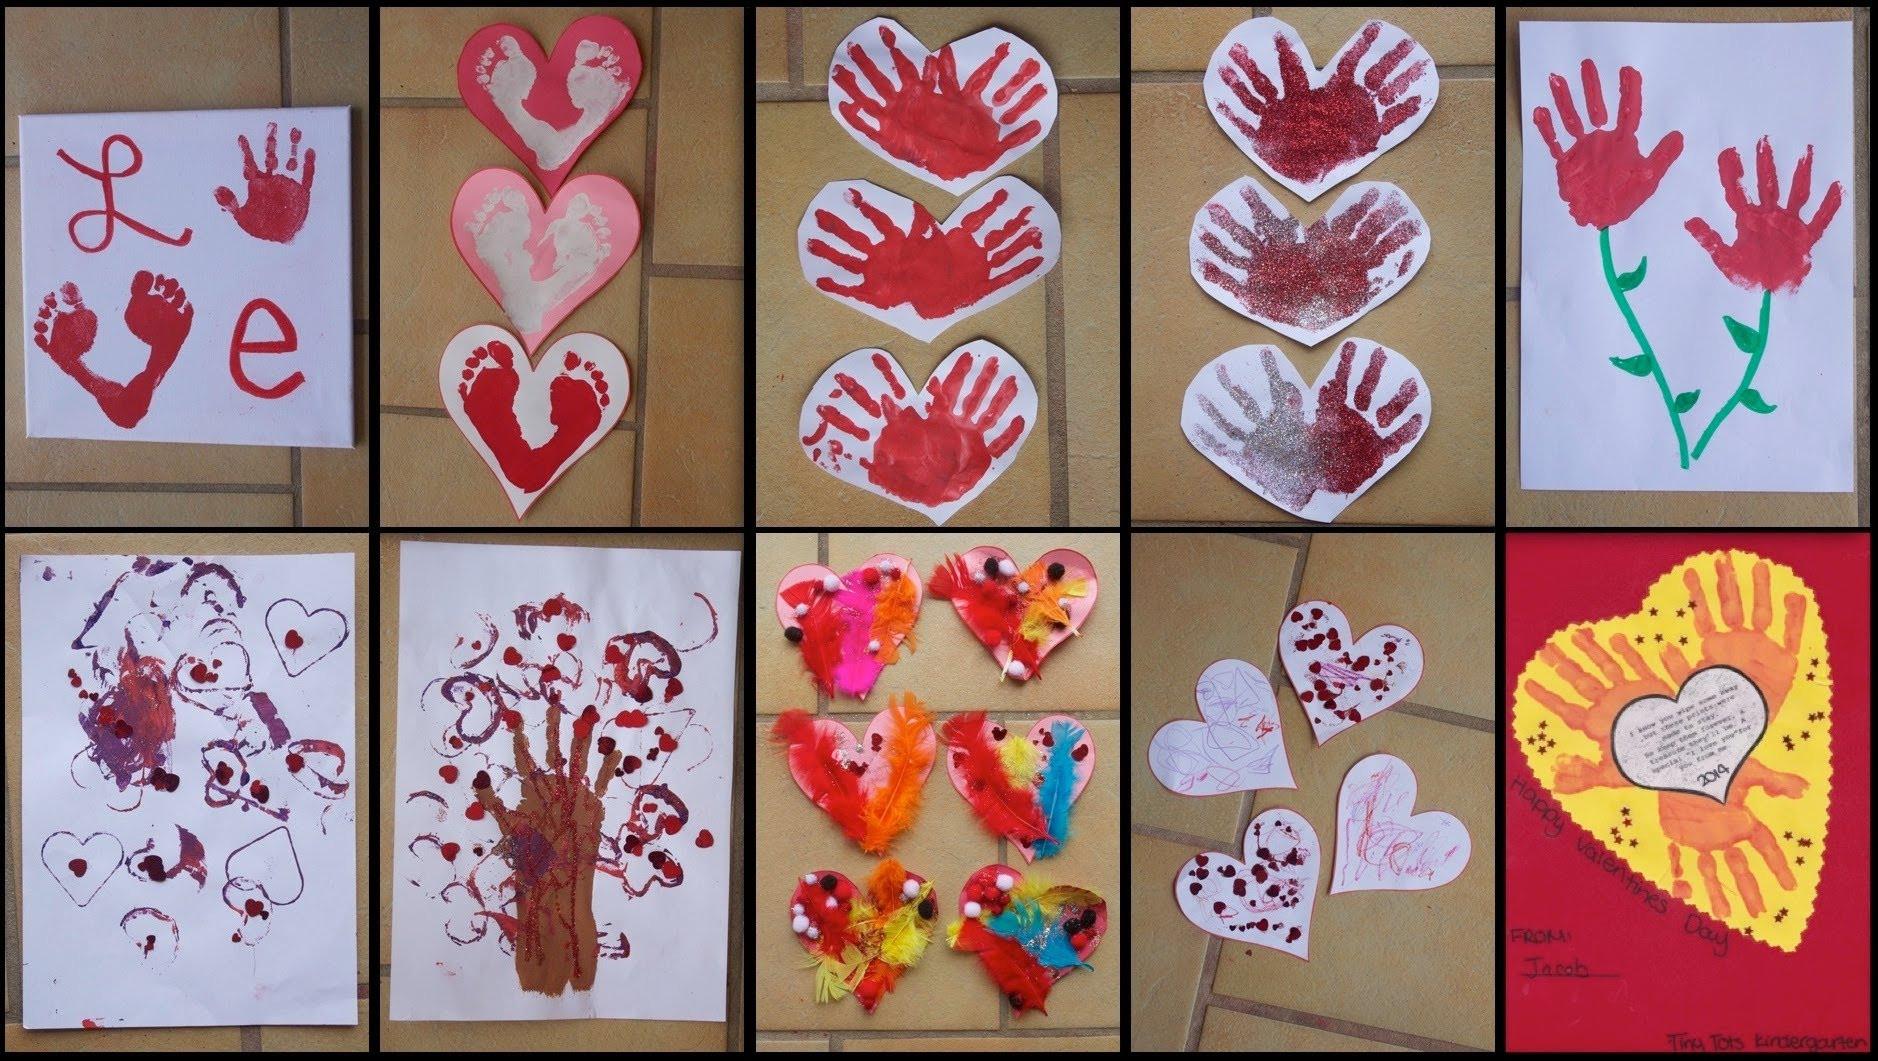 Valentine Craft Ideas For Preschoolers  9 VALENTINE'S DAY CRAFTS FOR TODDLERS KIDS